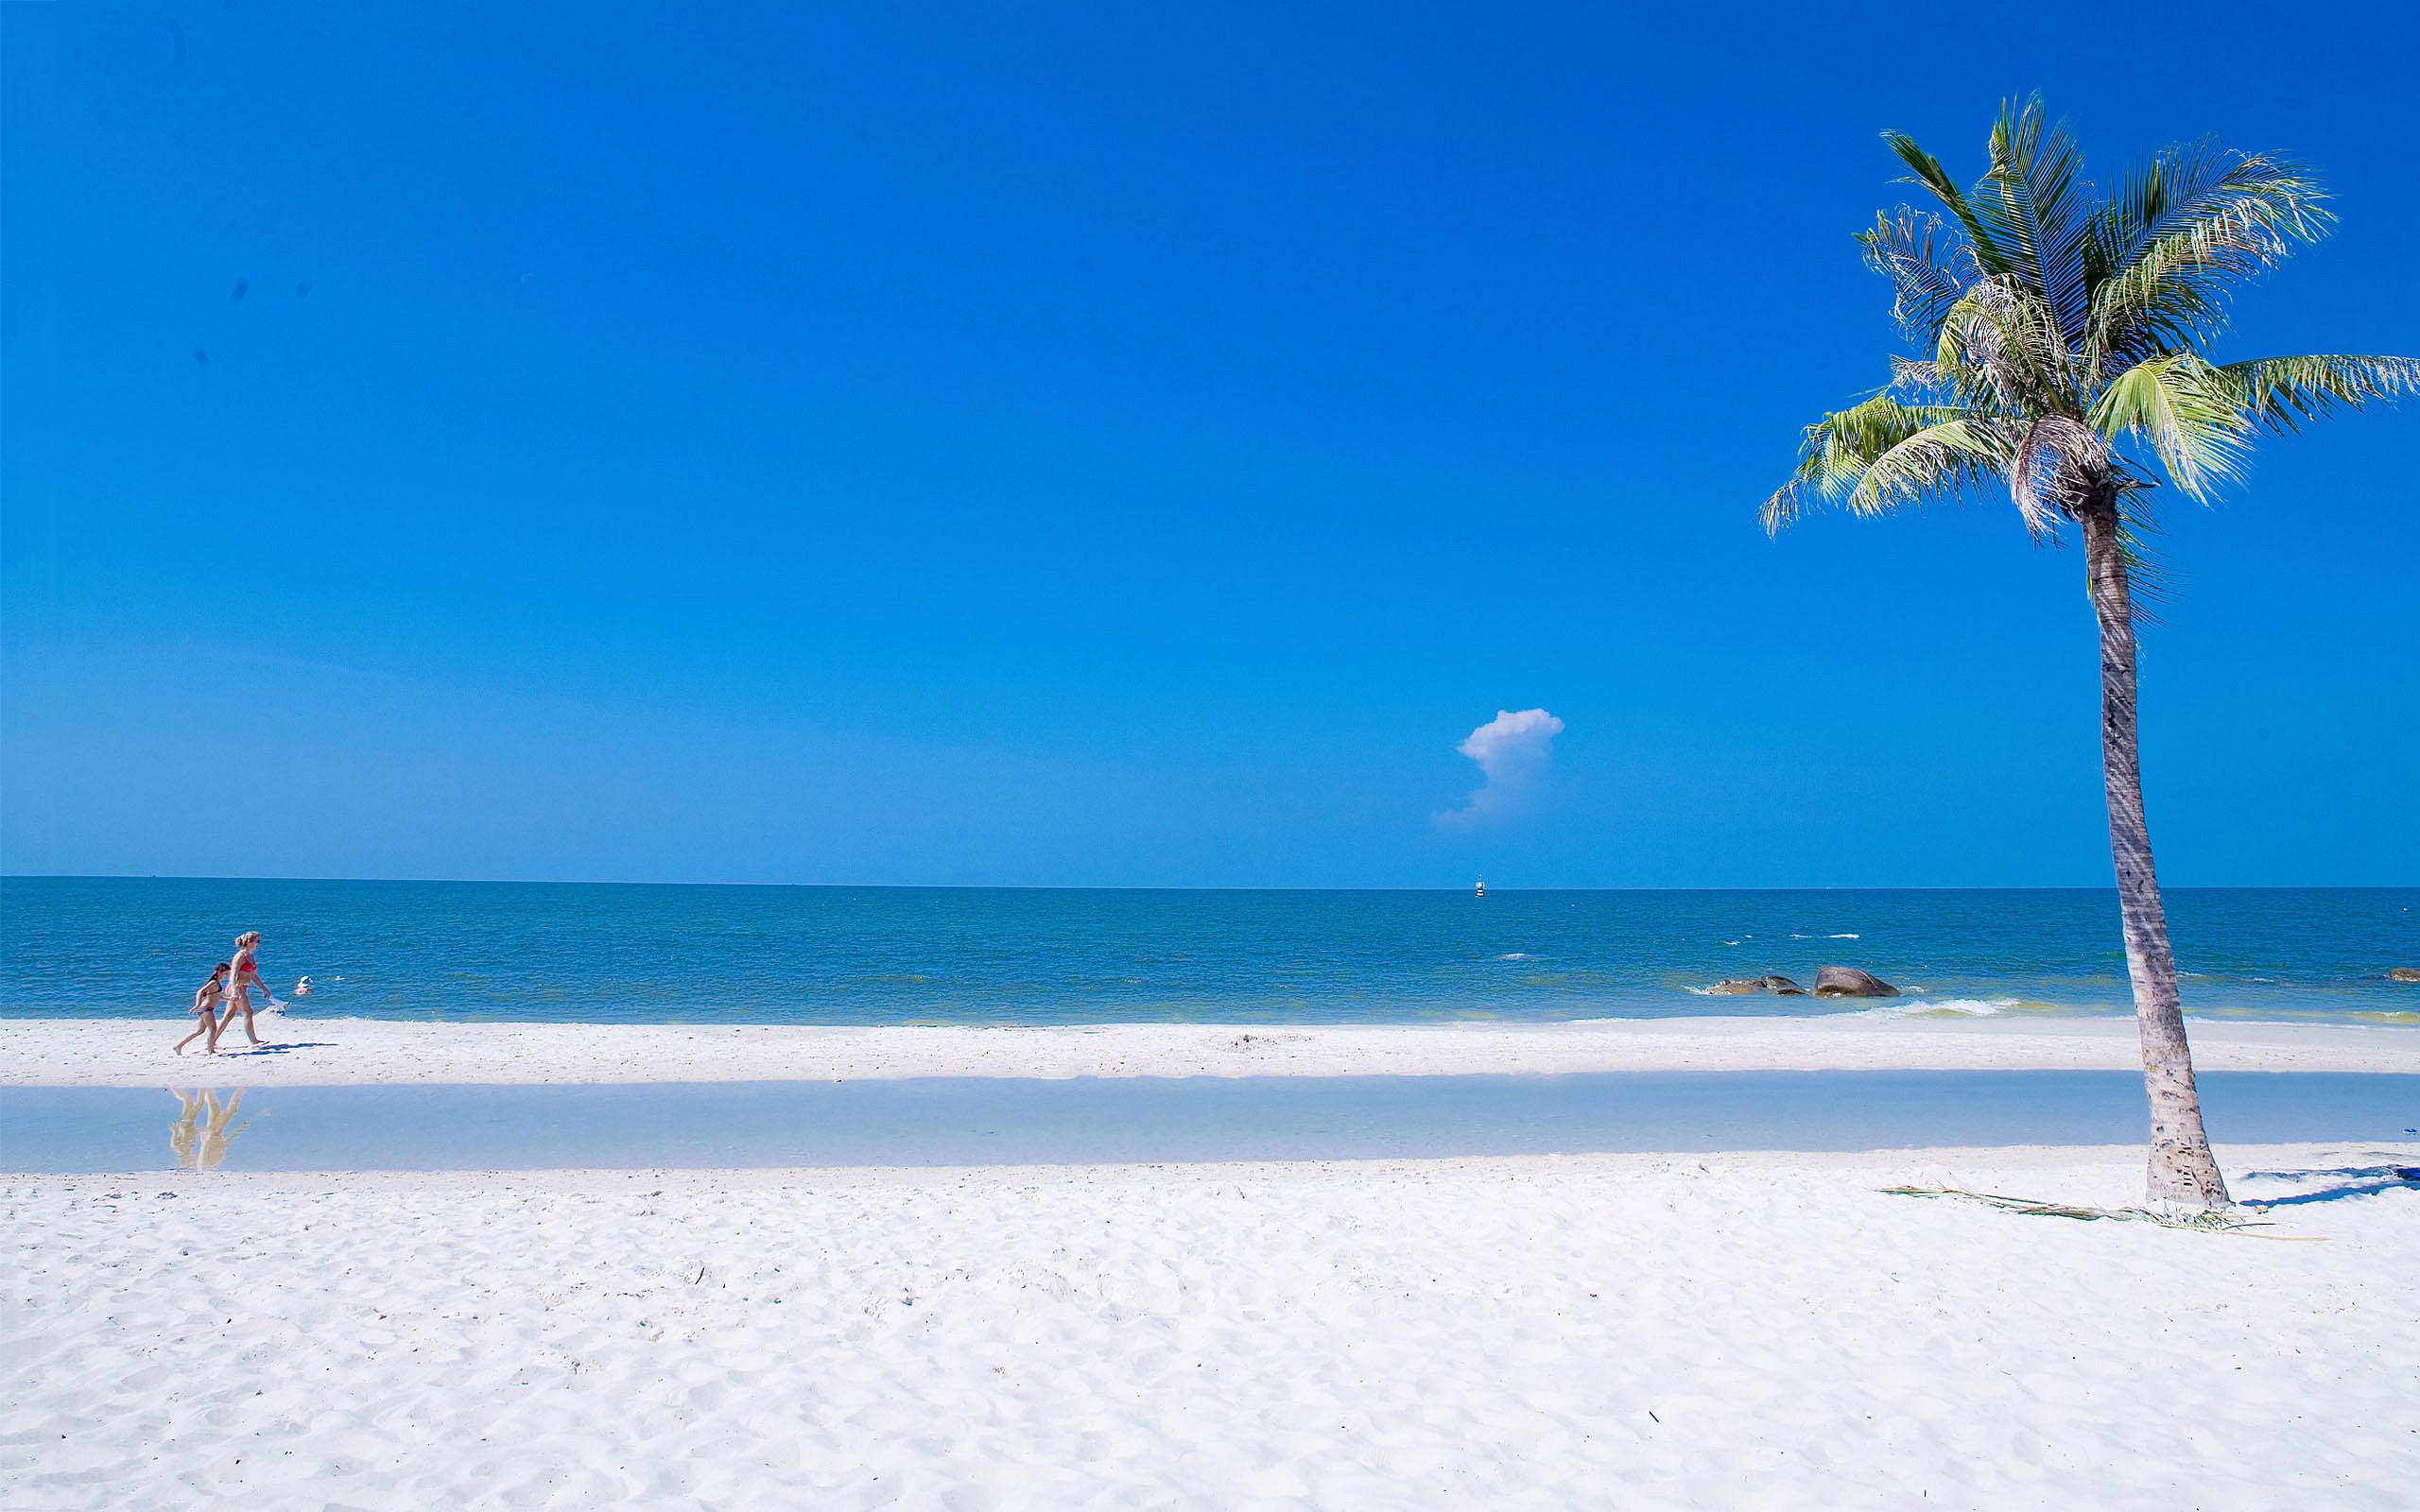 Beach Summer Ocean Wallpaper Full HD For Desktop